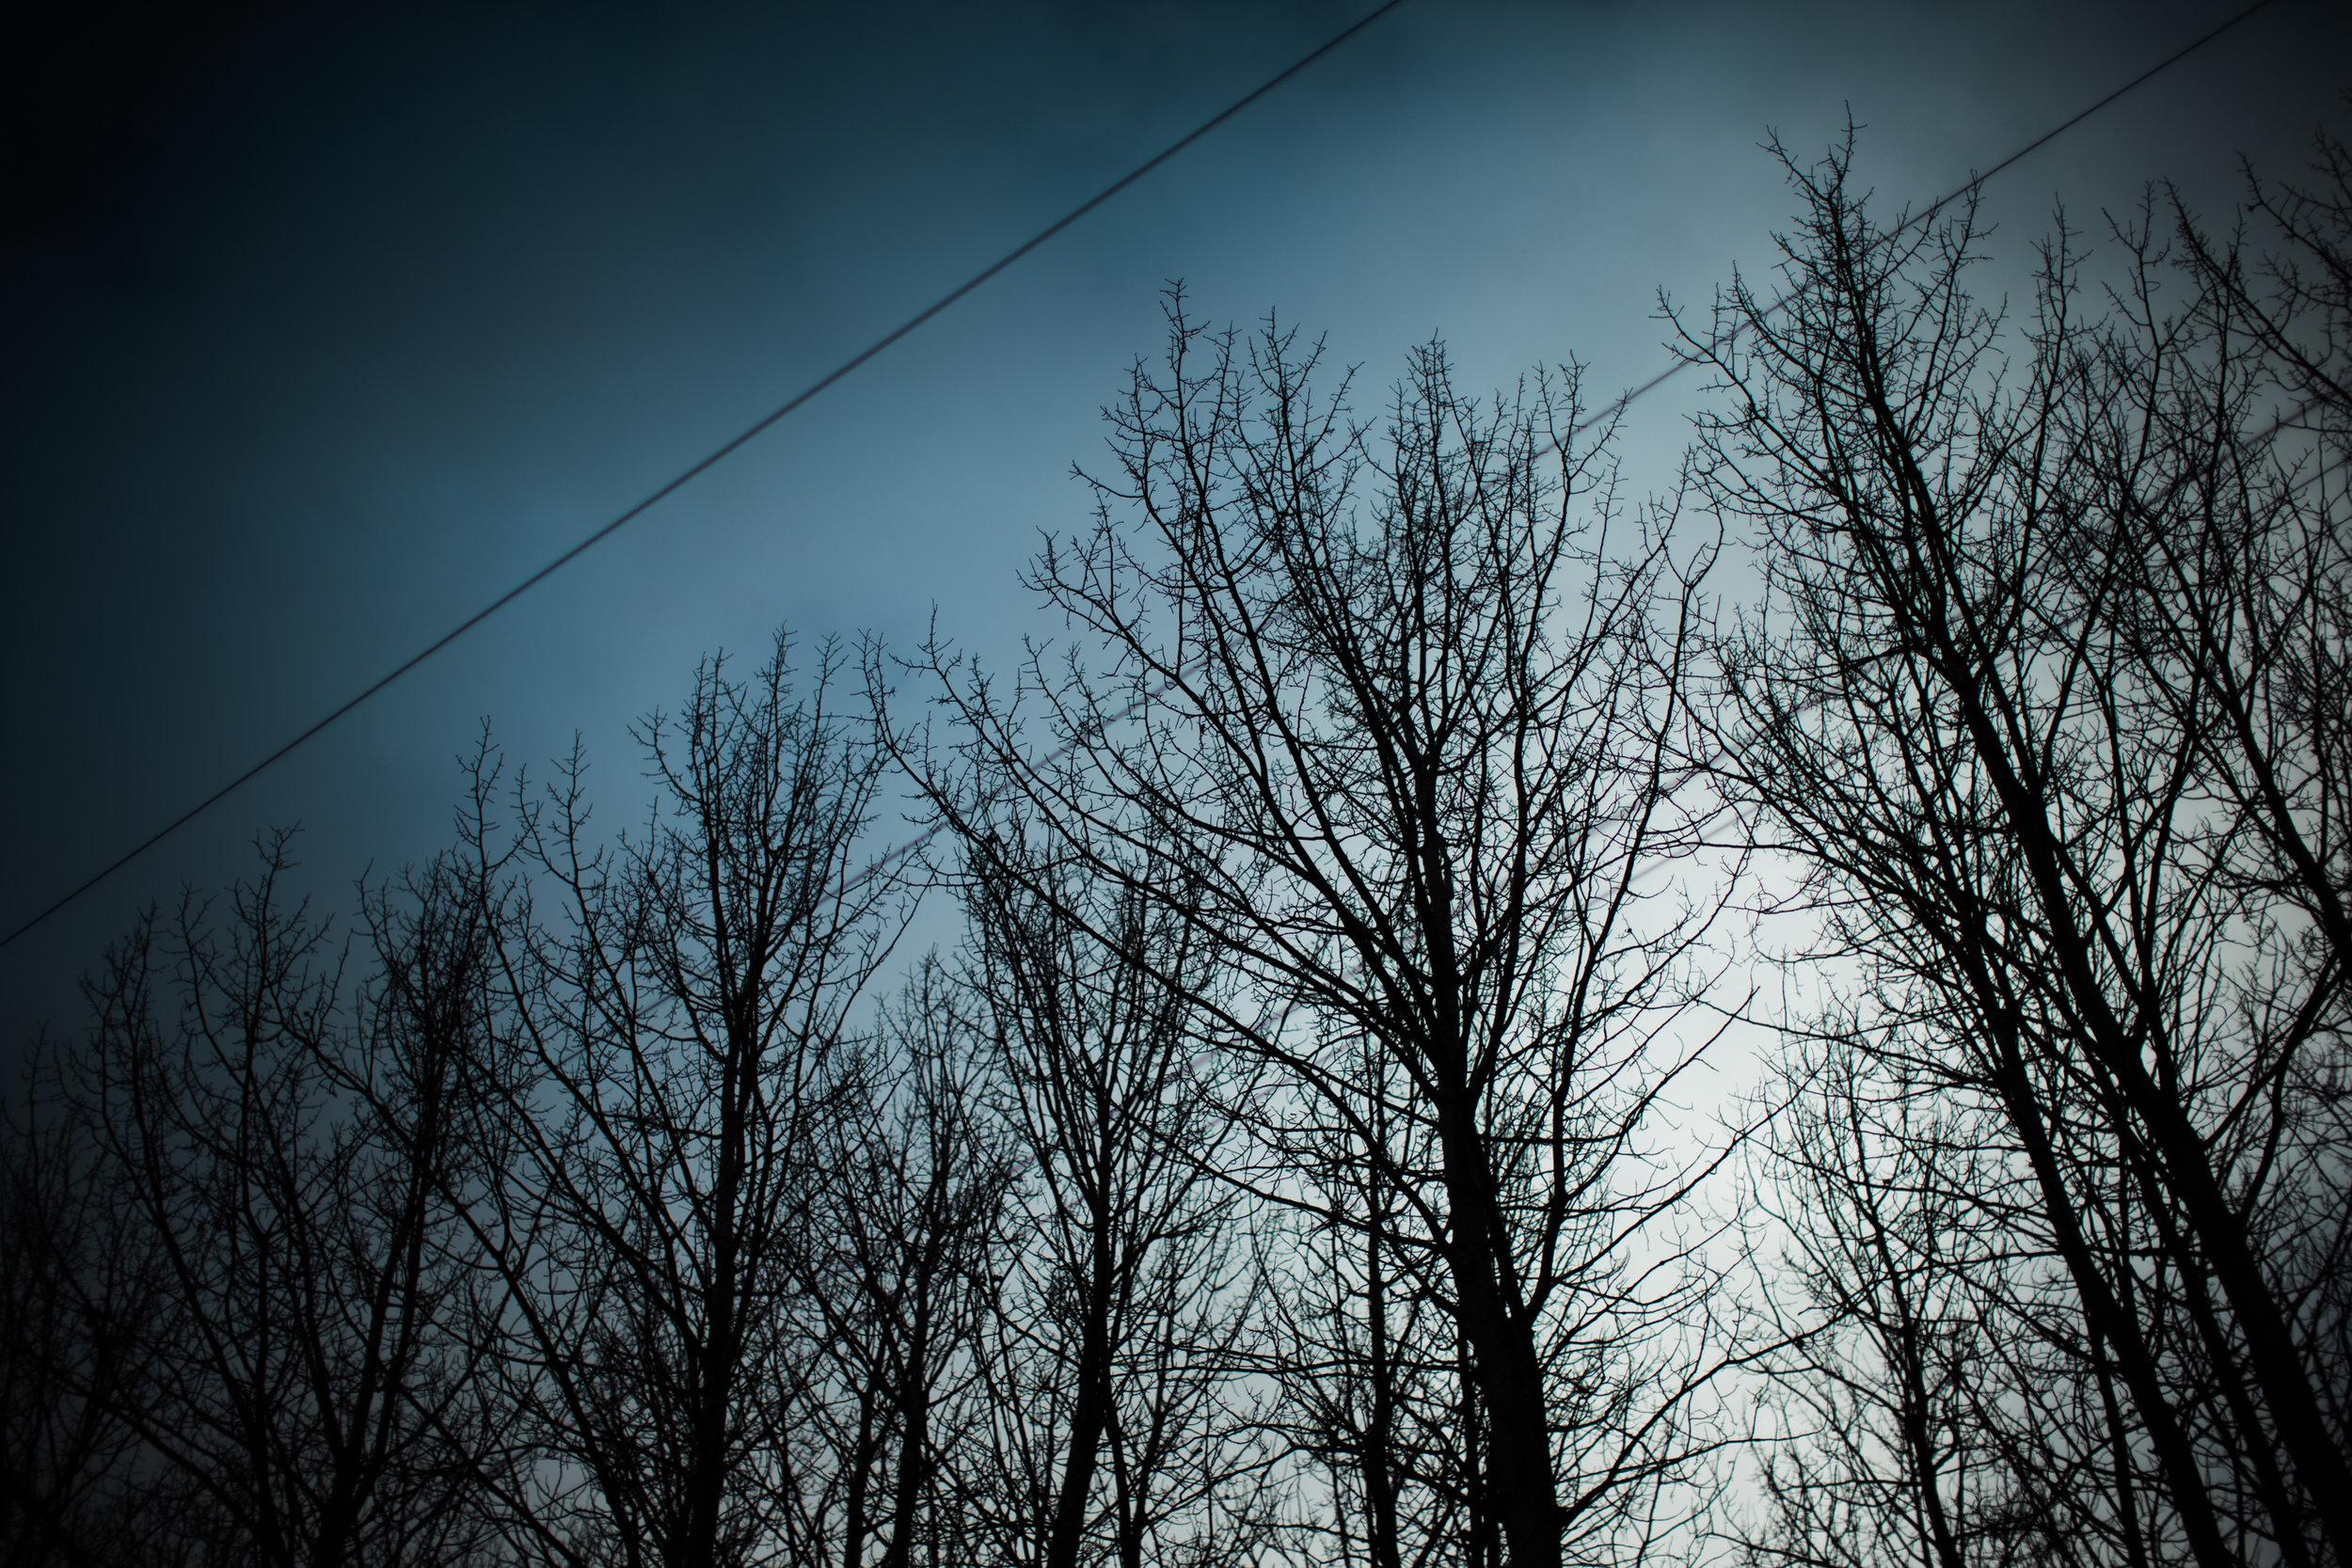 Dark_Clouds.jpg